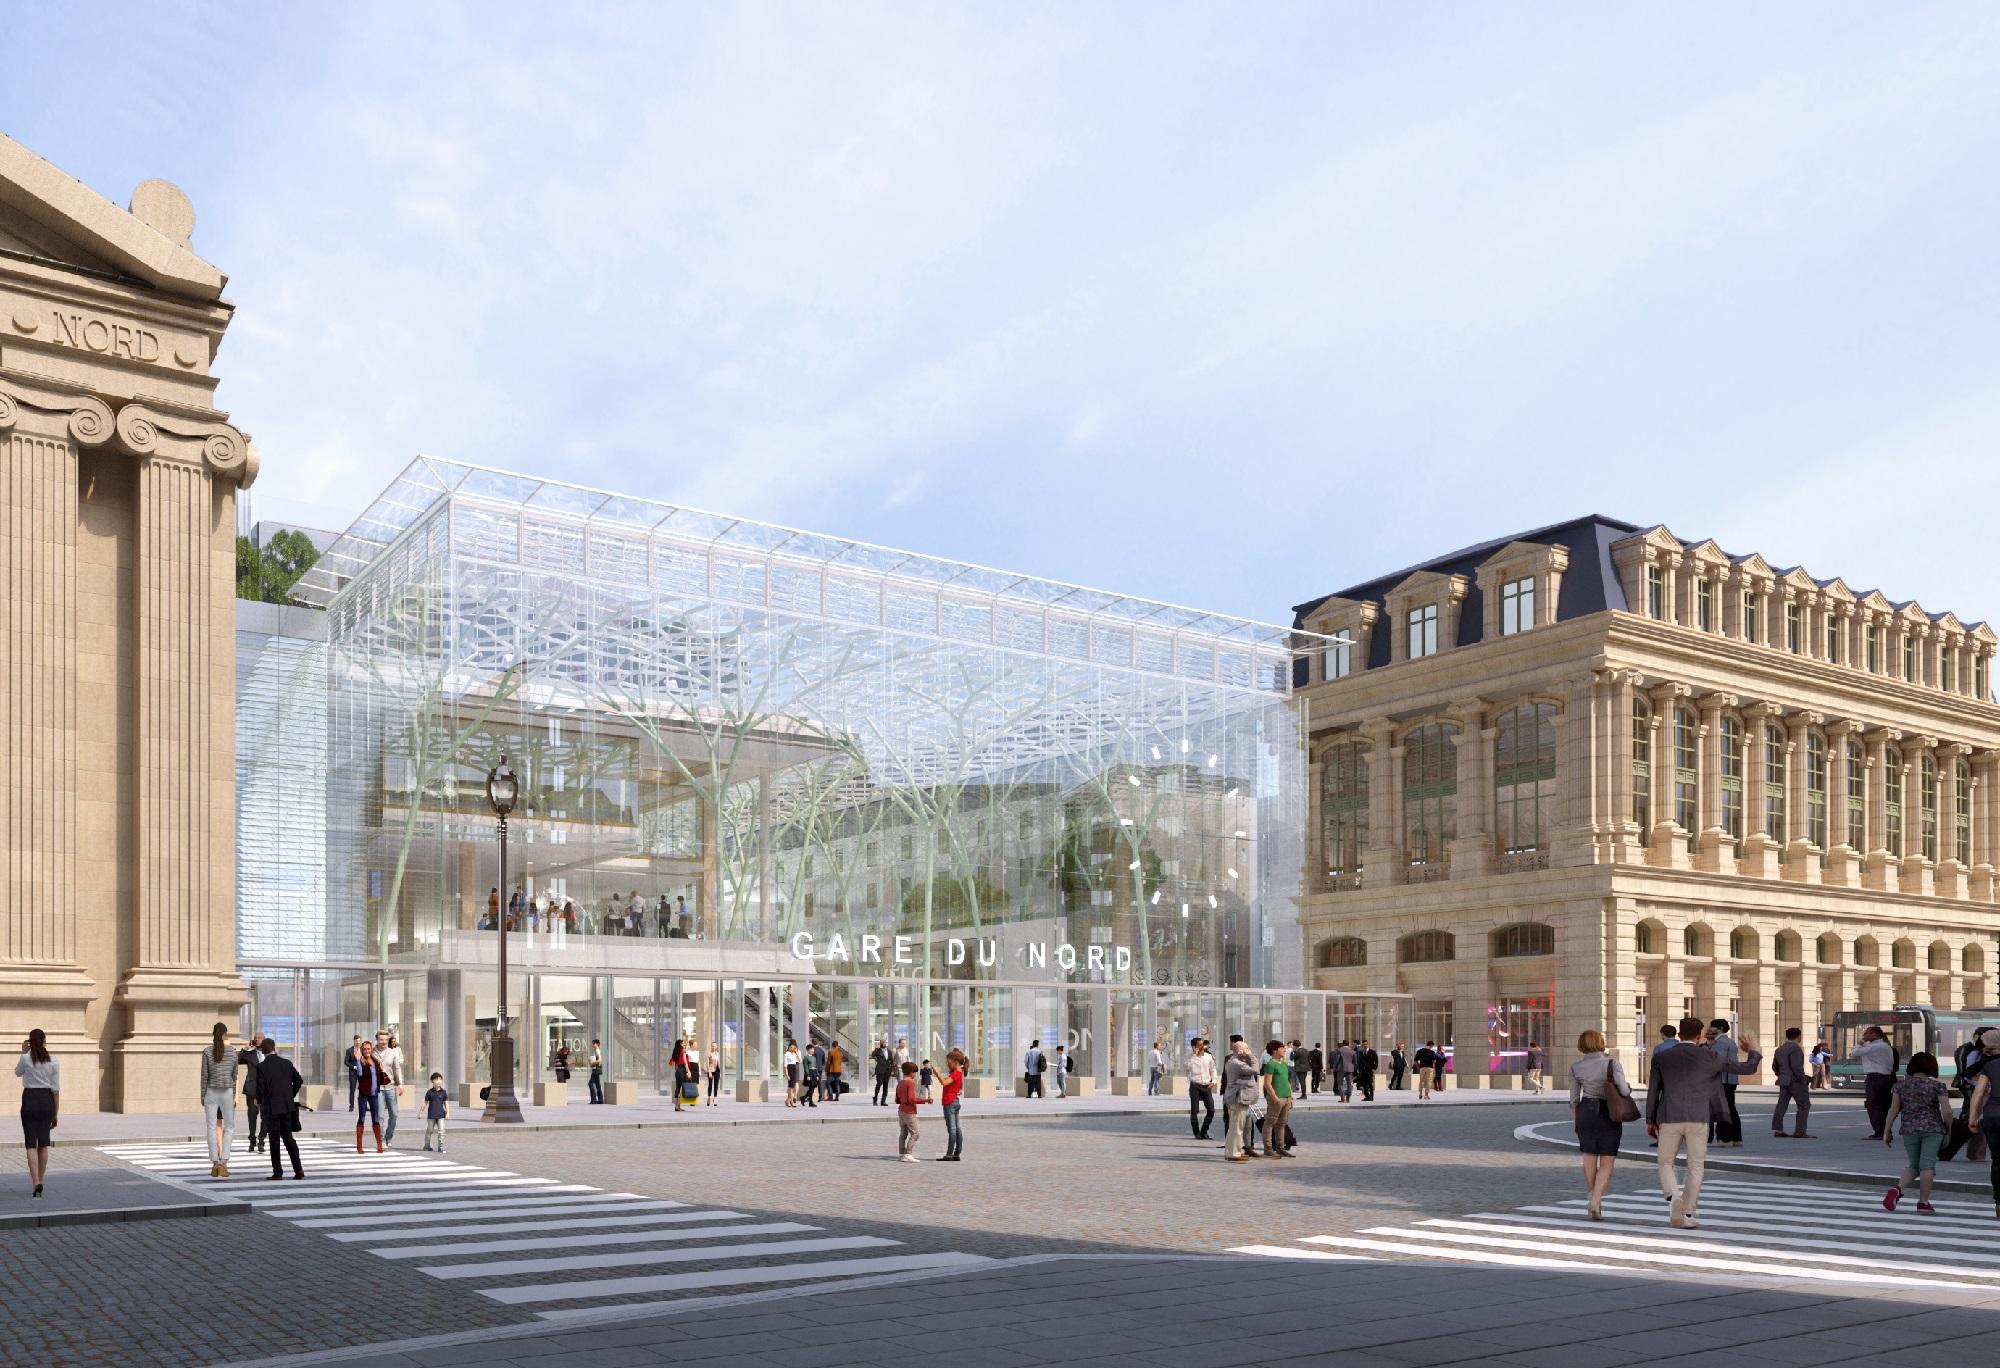 Gare du Nord 2024, projet de transformation de la Gare du Nord